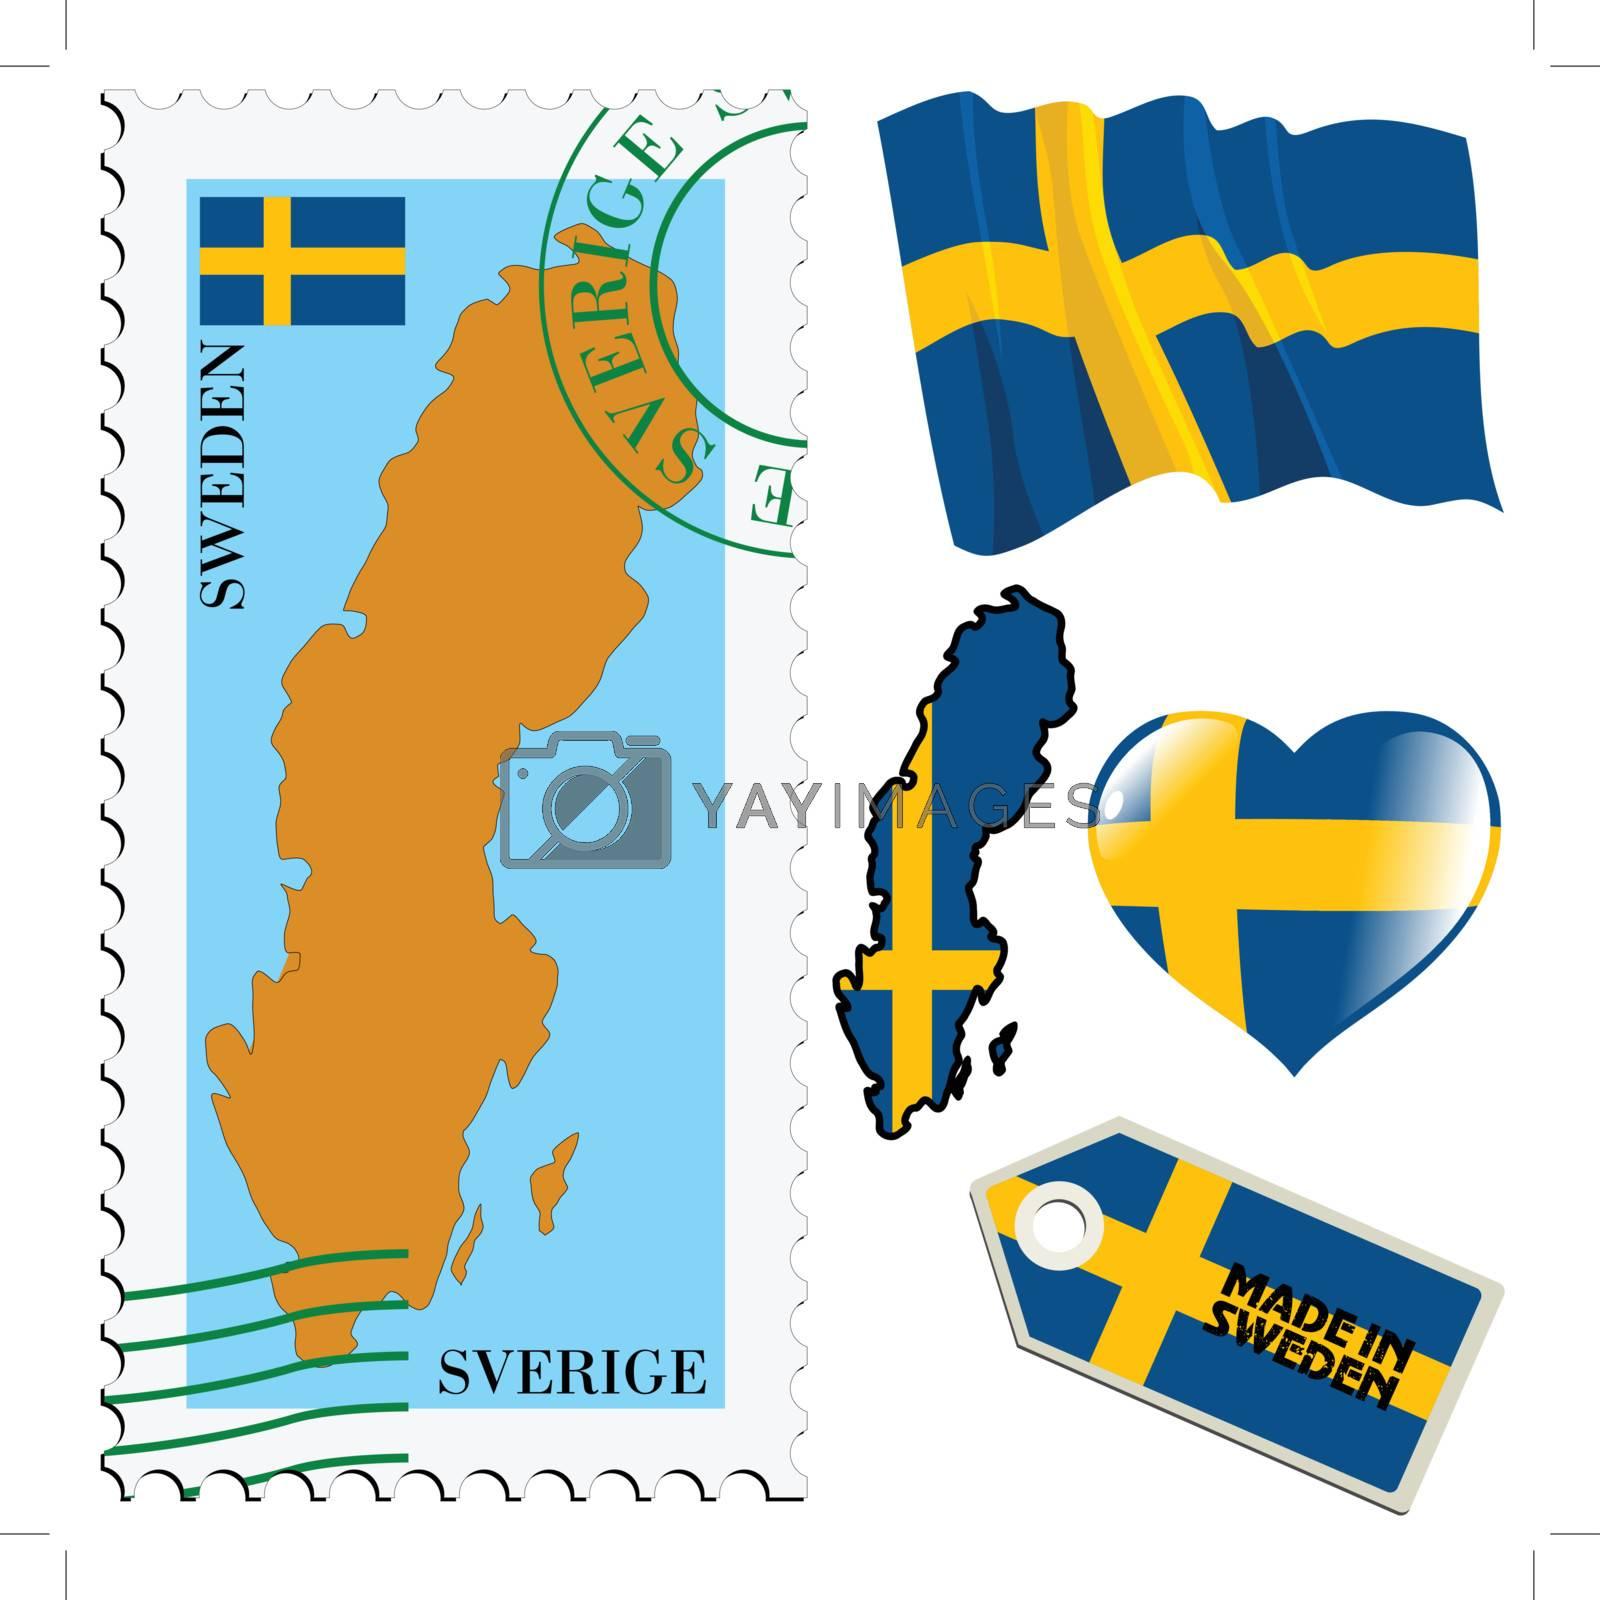 set of different symbols in national colours of Sweden